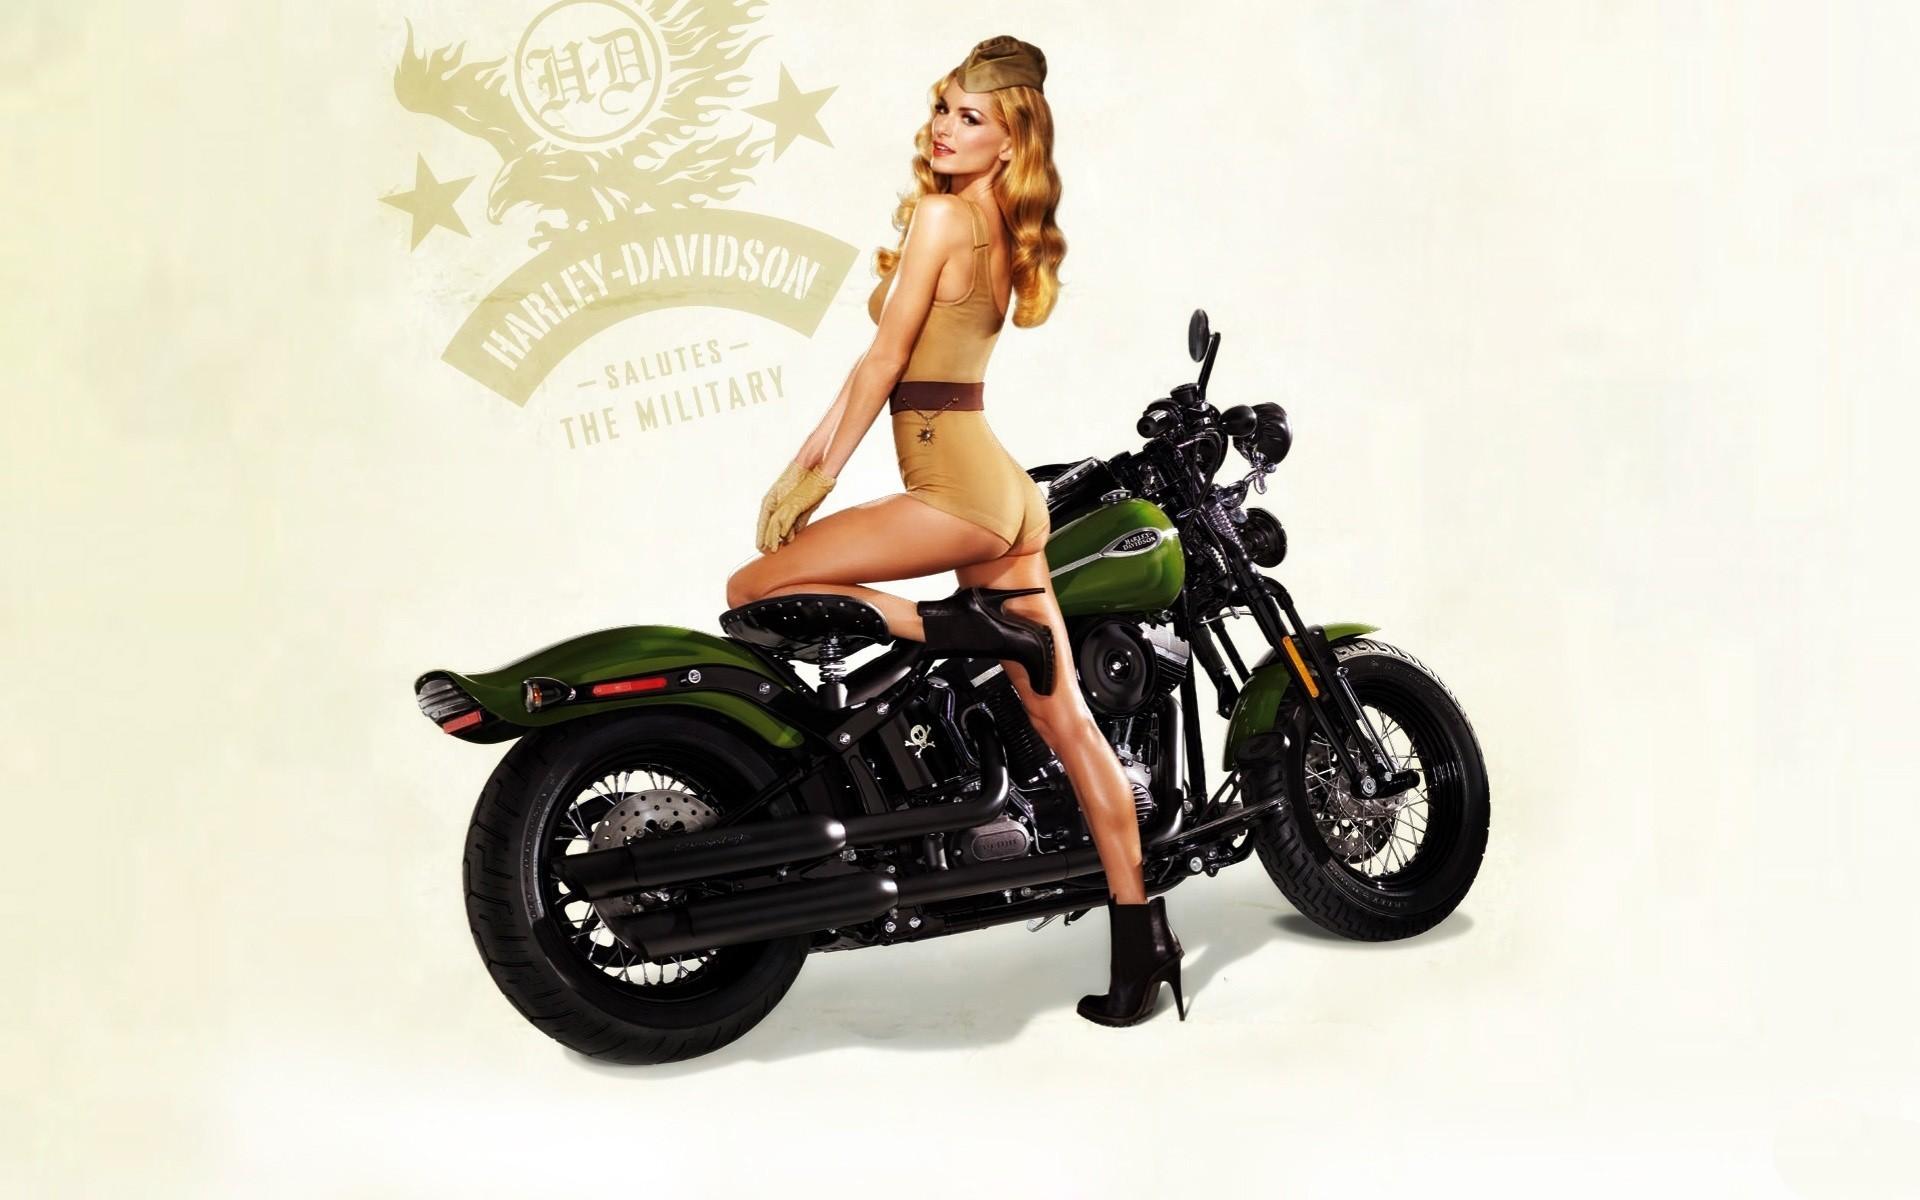 blondes women motorbike vintage pinup harley davidson army girls  wallpaper of-PhotoBoats.